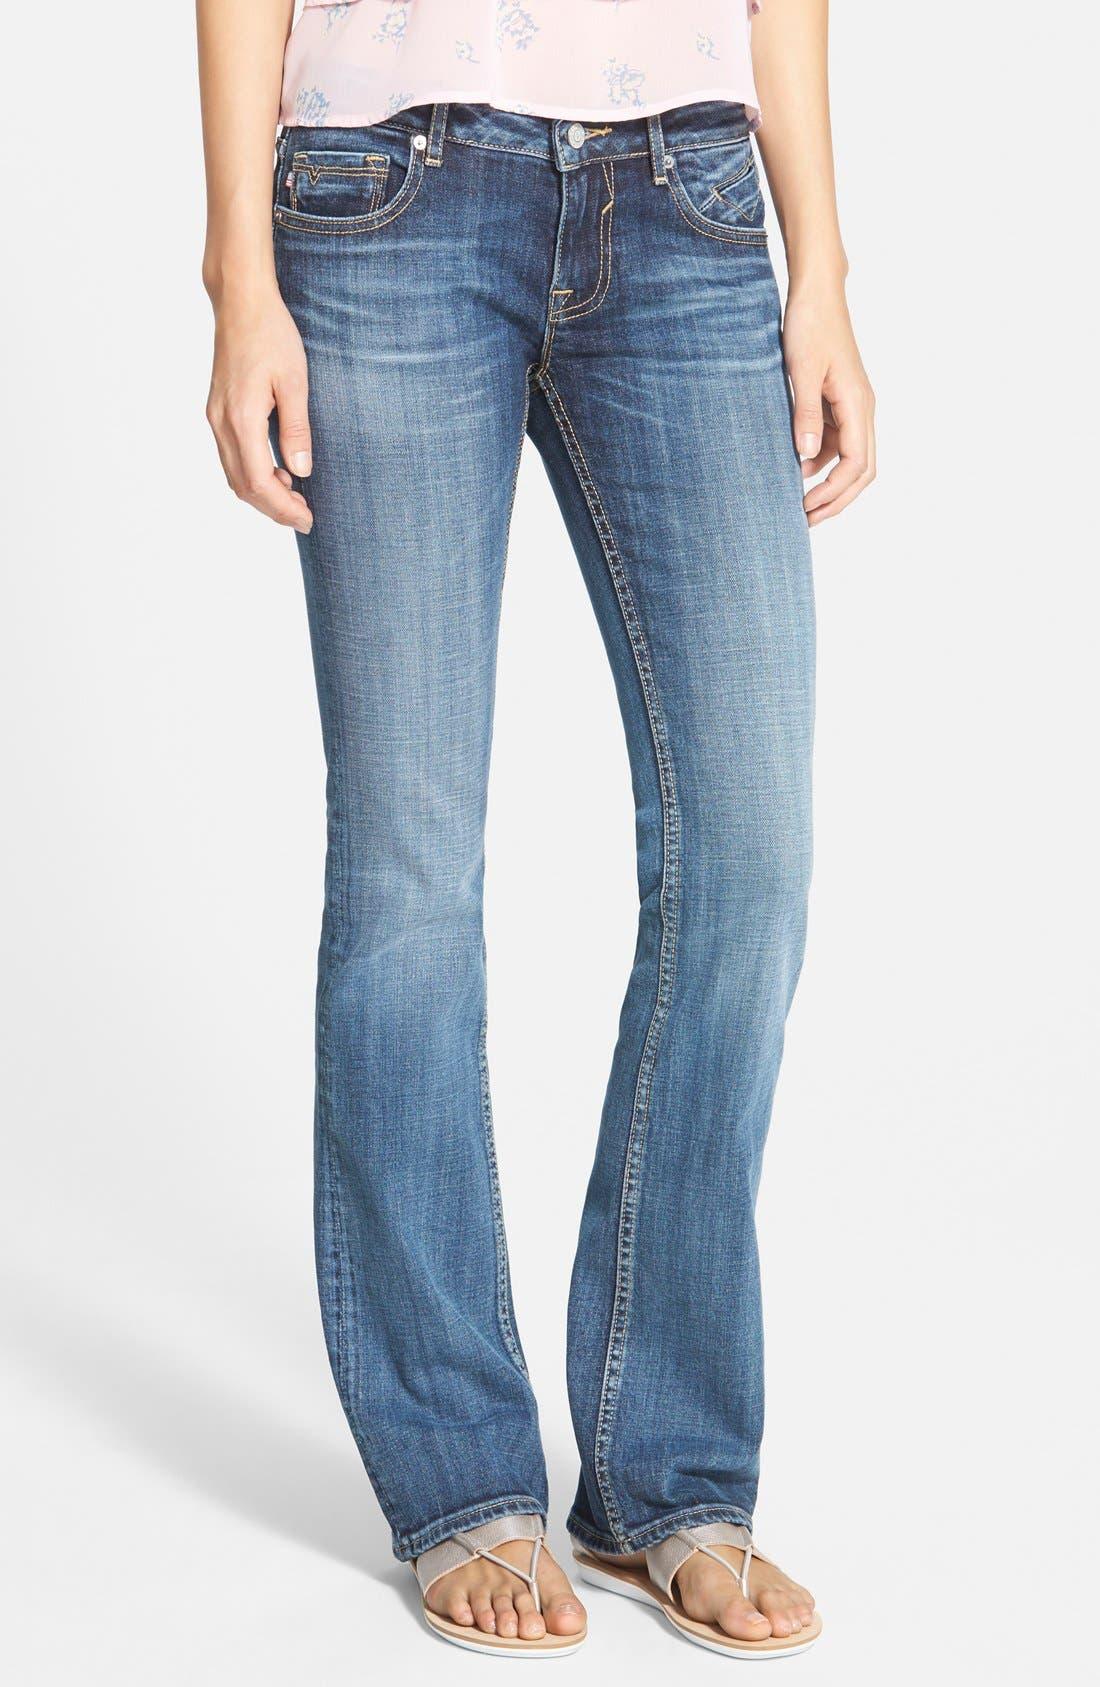 Alternate Image 1 Selected - Vigoss 'NY' Bootcut Jeans (Dark Wash)